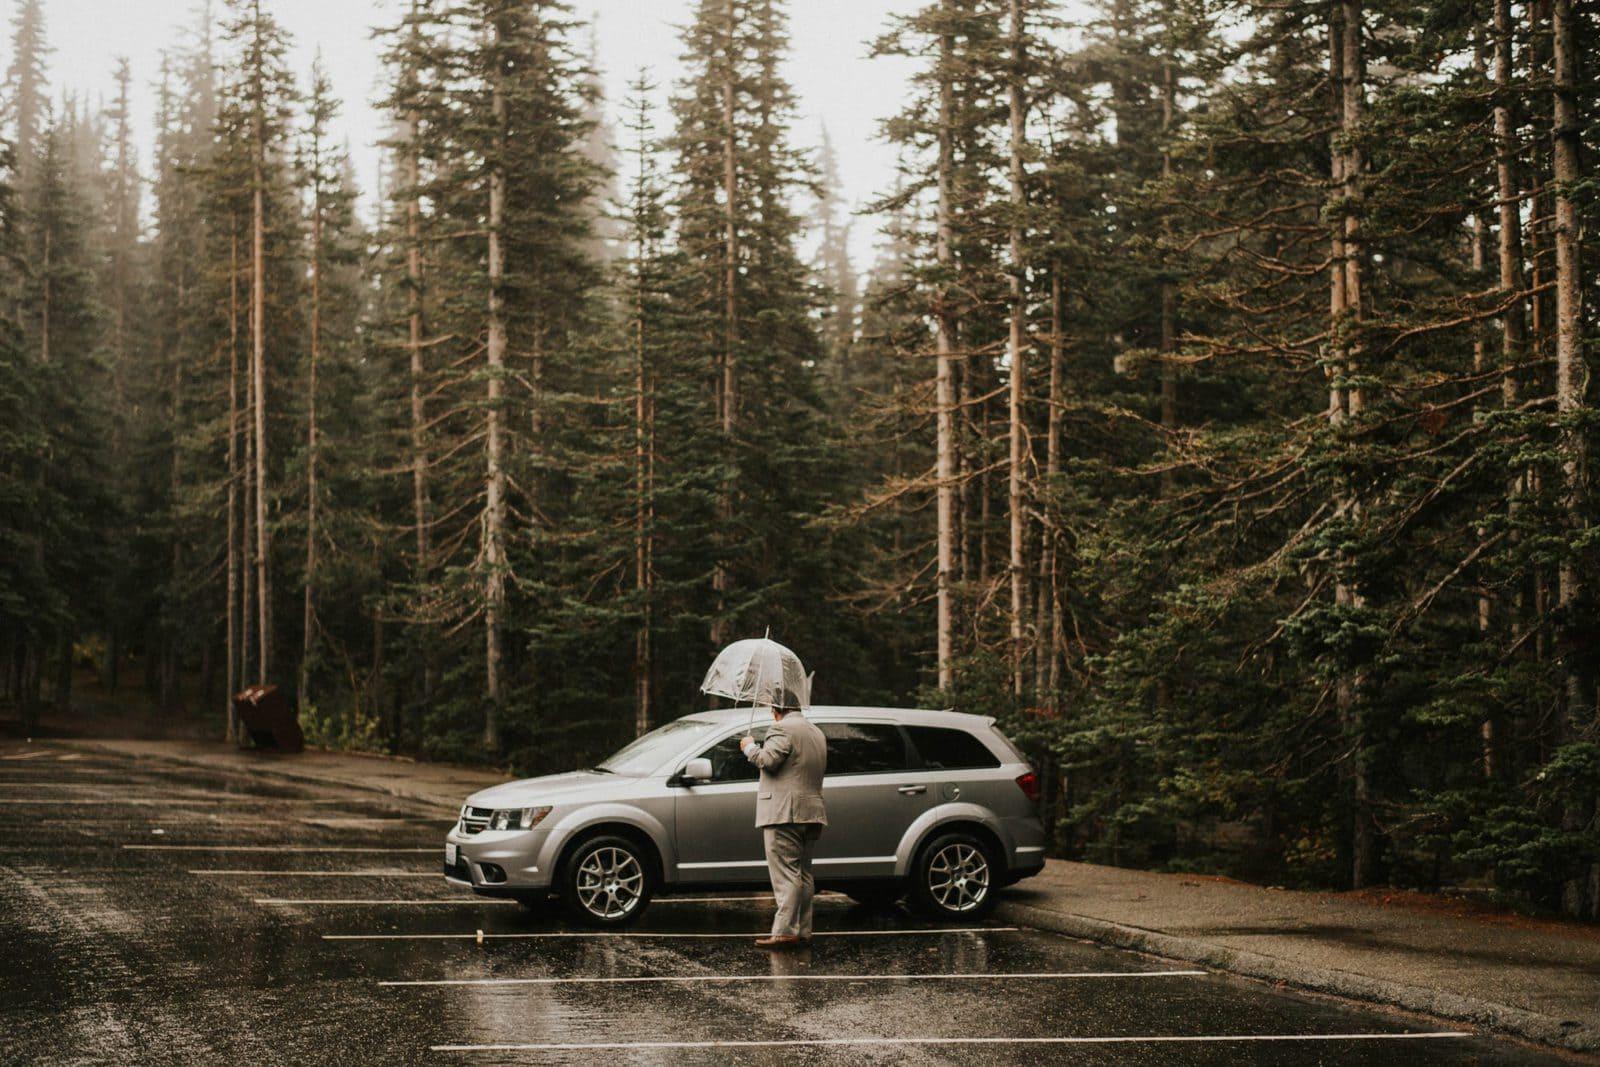 Groom standing by car